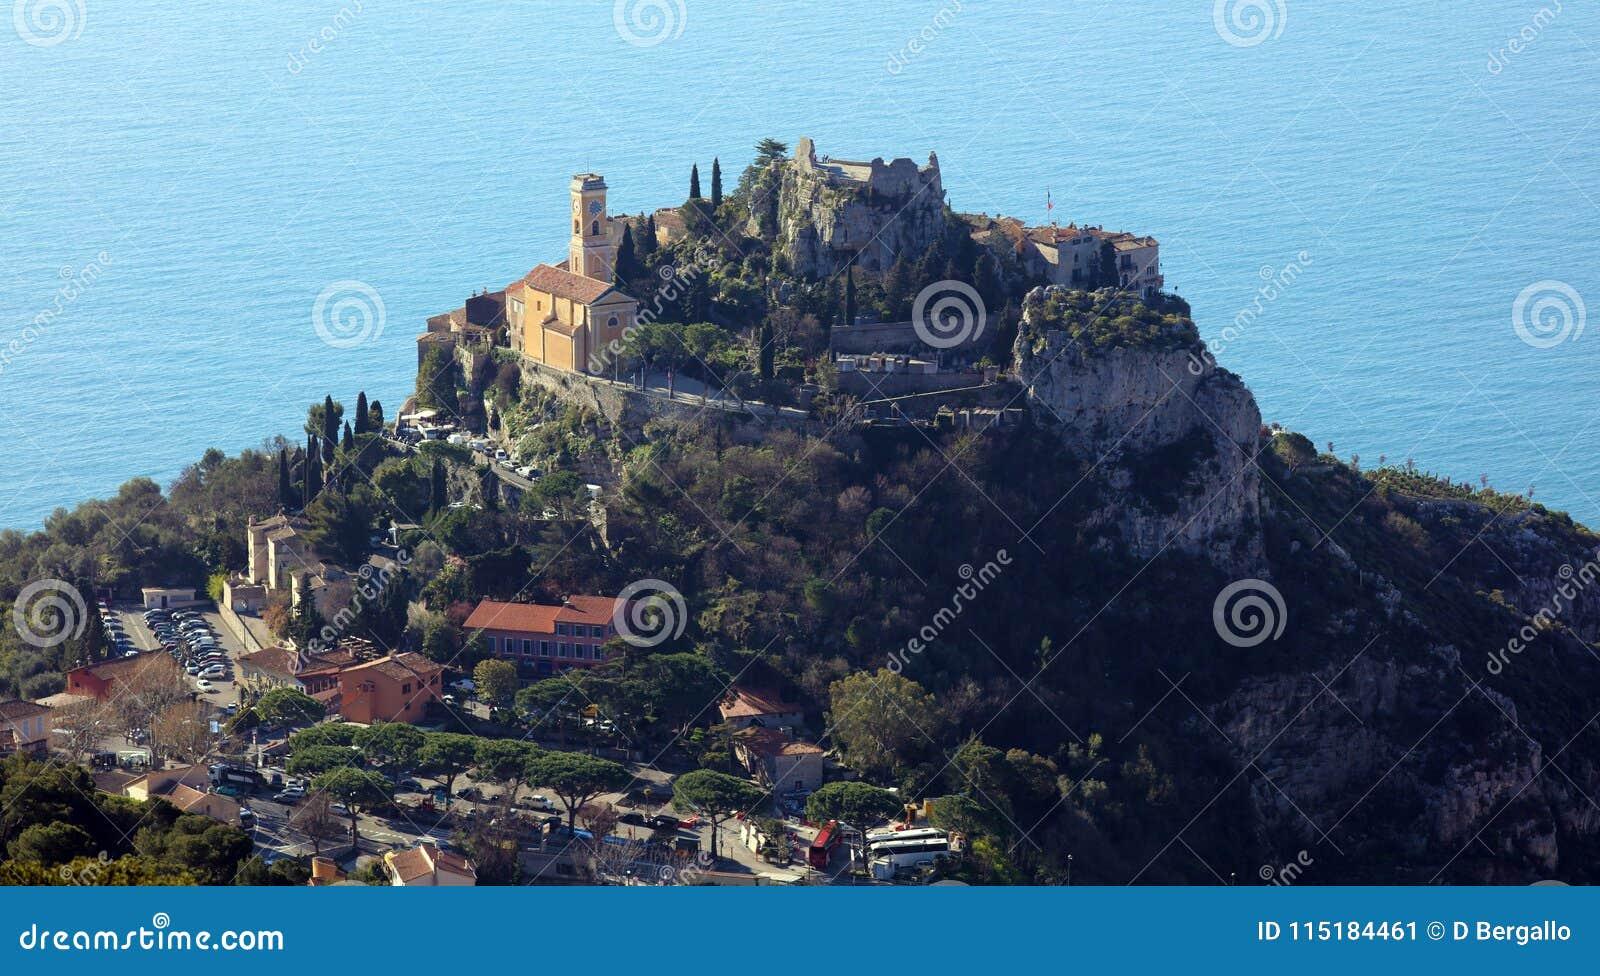 Eze village French riviera, Côte d`Azur, mediterranean coast, Eze, Saint-Tropez, Cannes and Monaco. Blue water and luxury yachts.